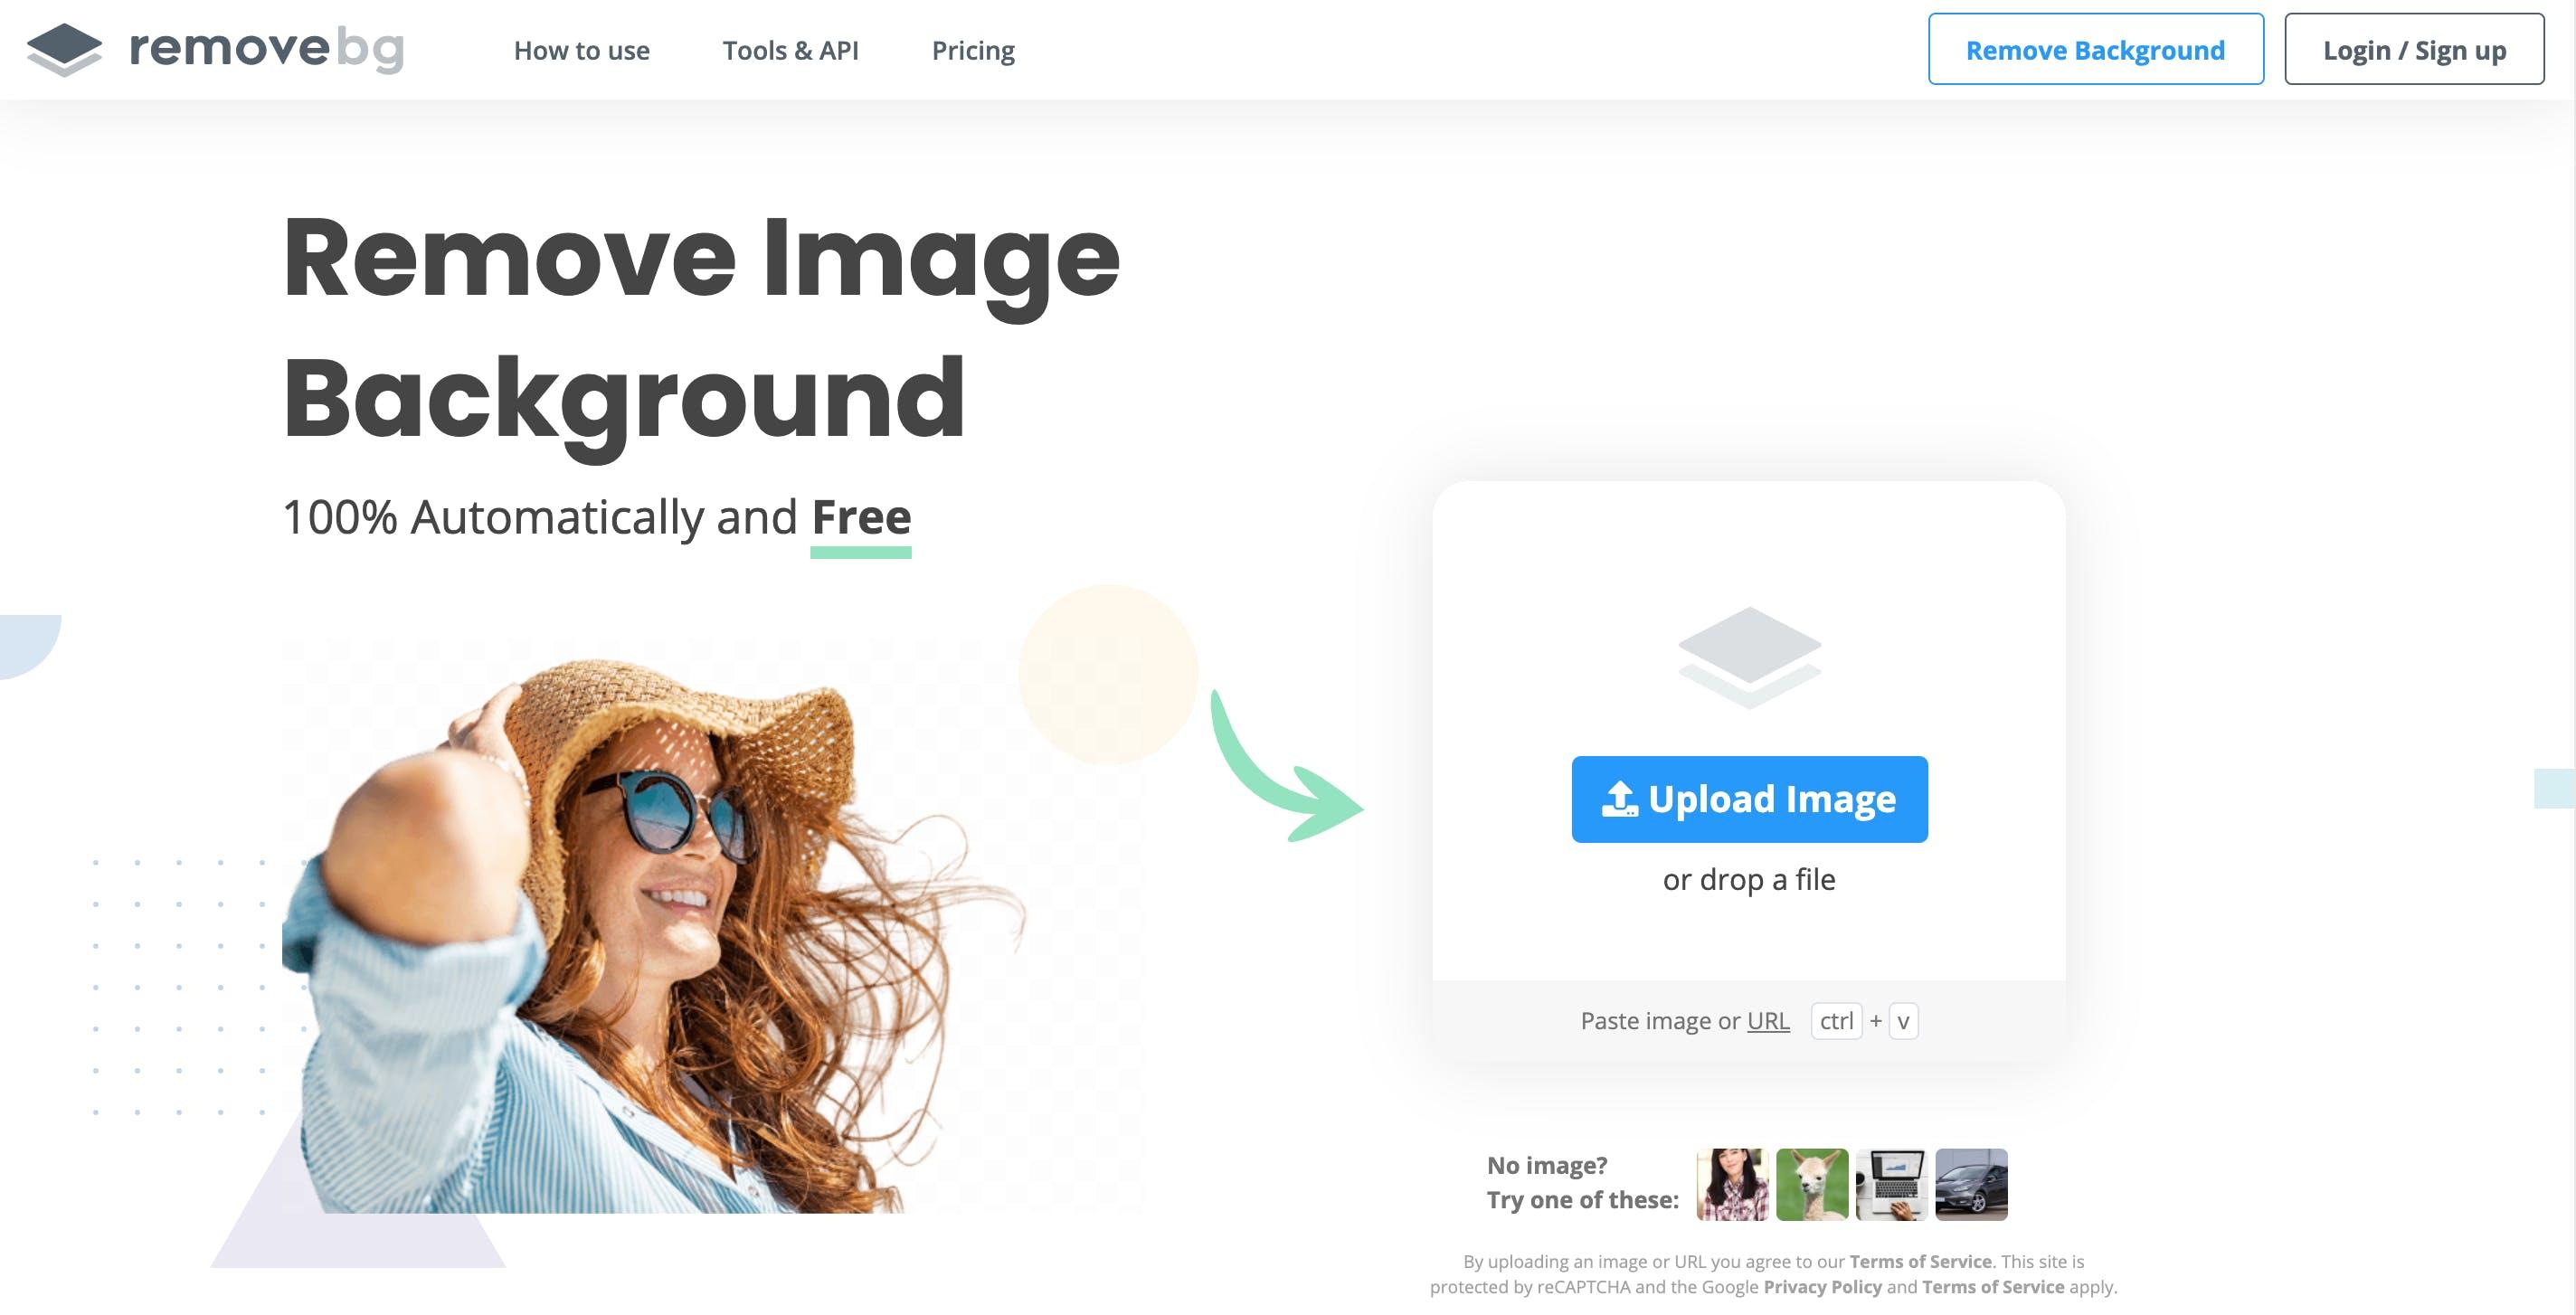 Screenshot of remove.bg homescreen